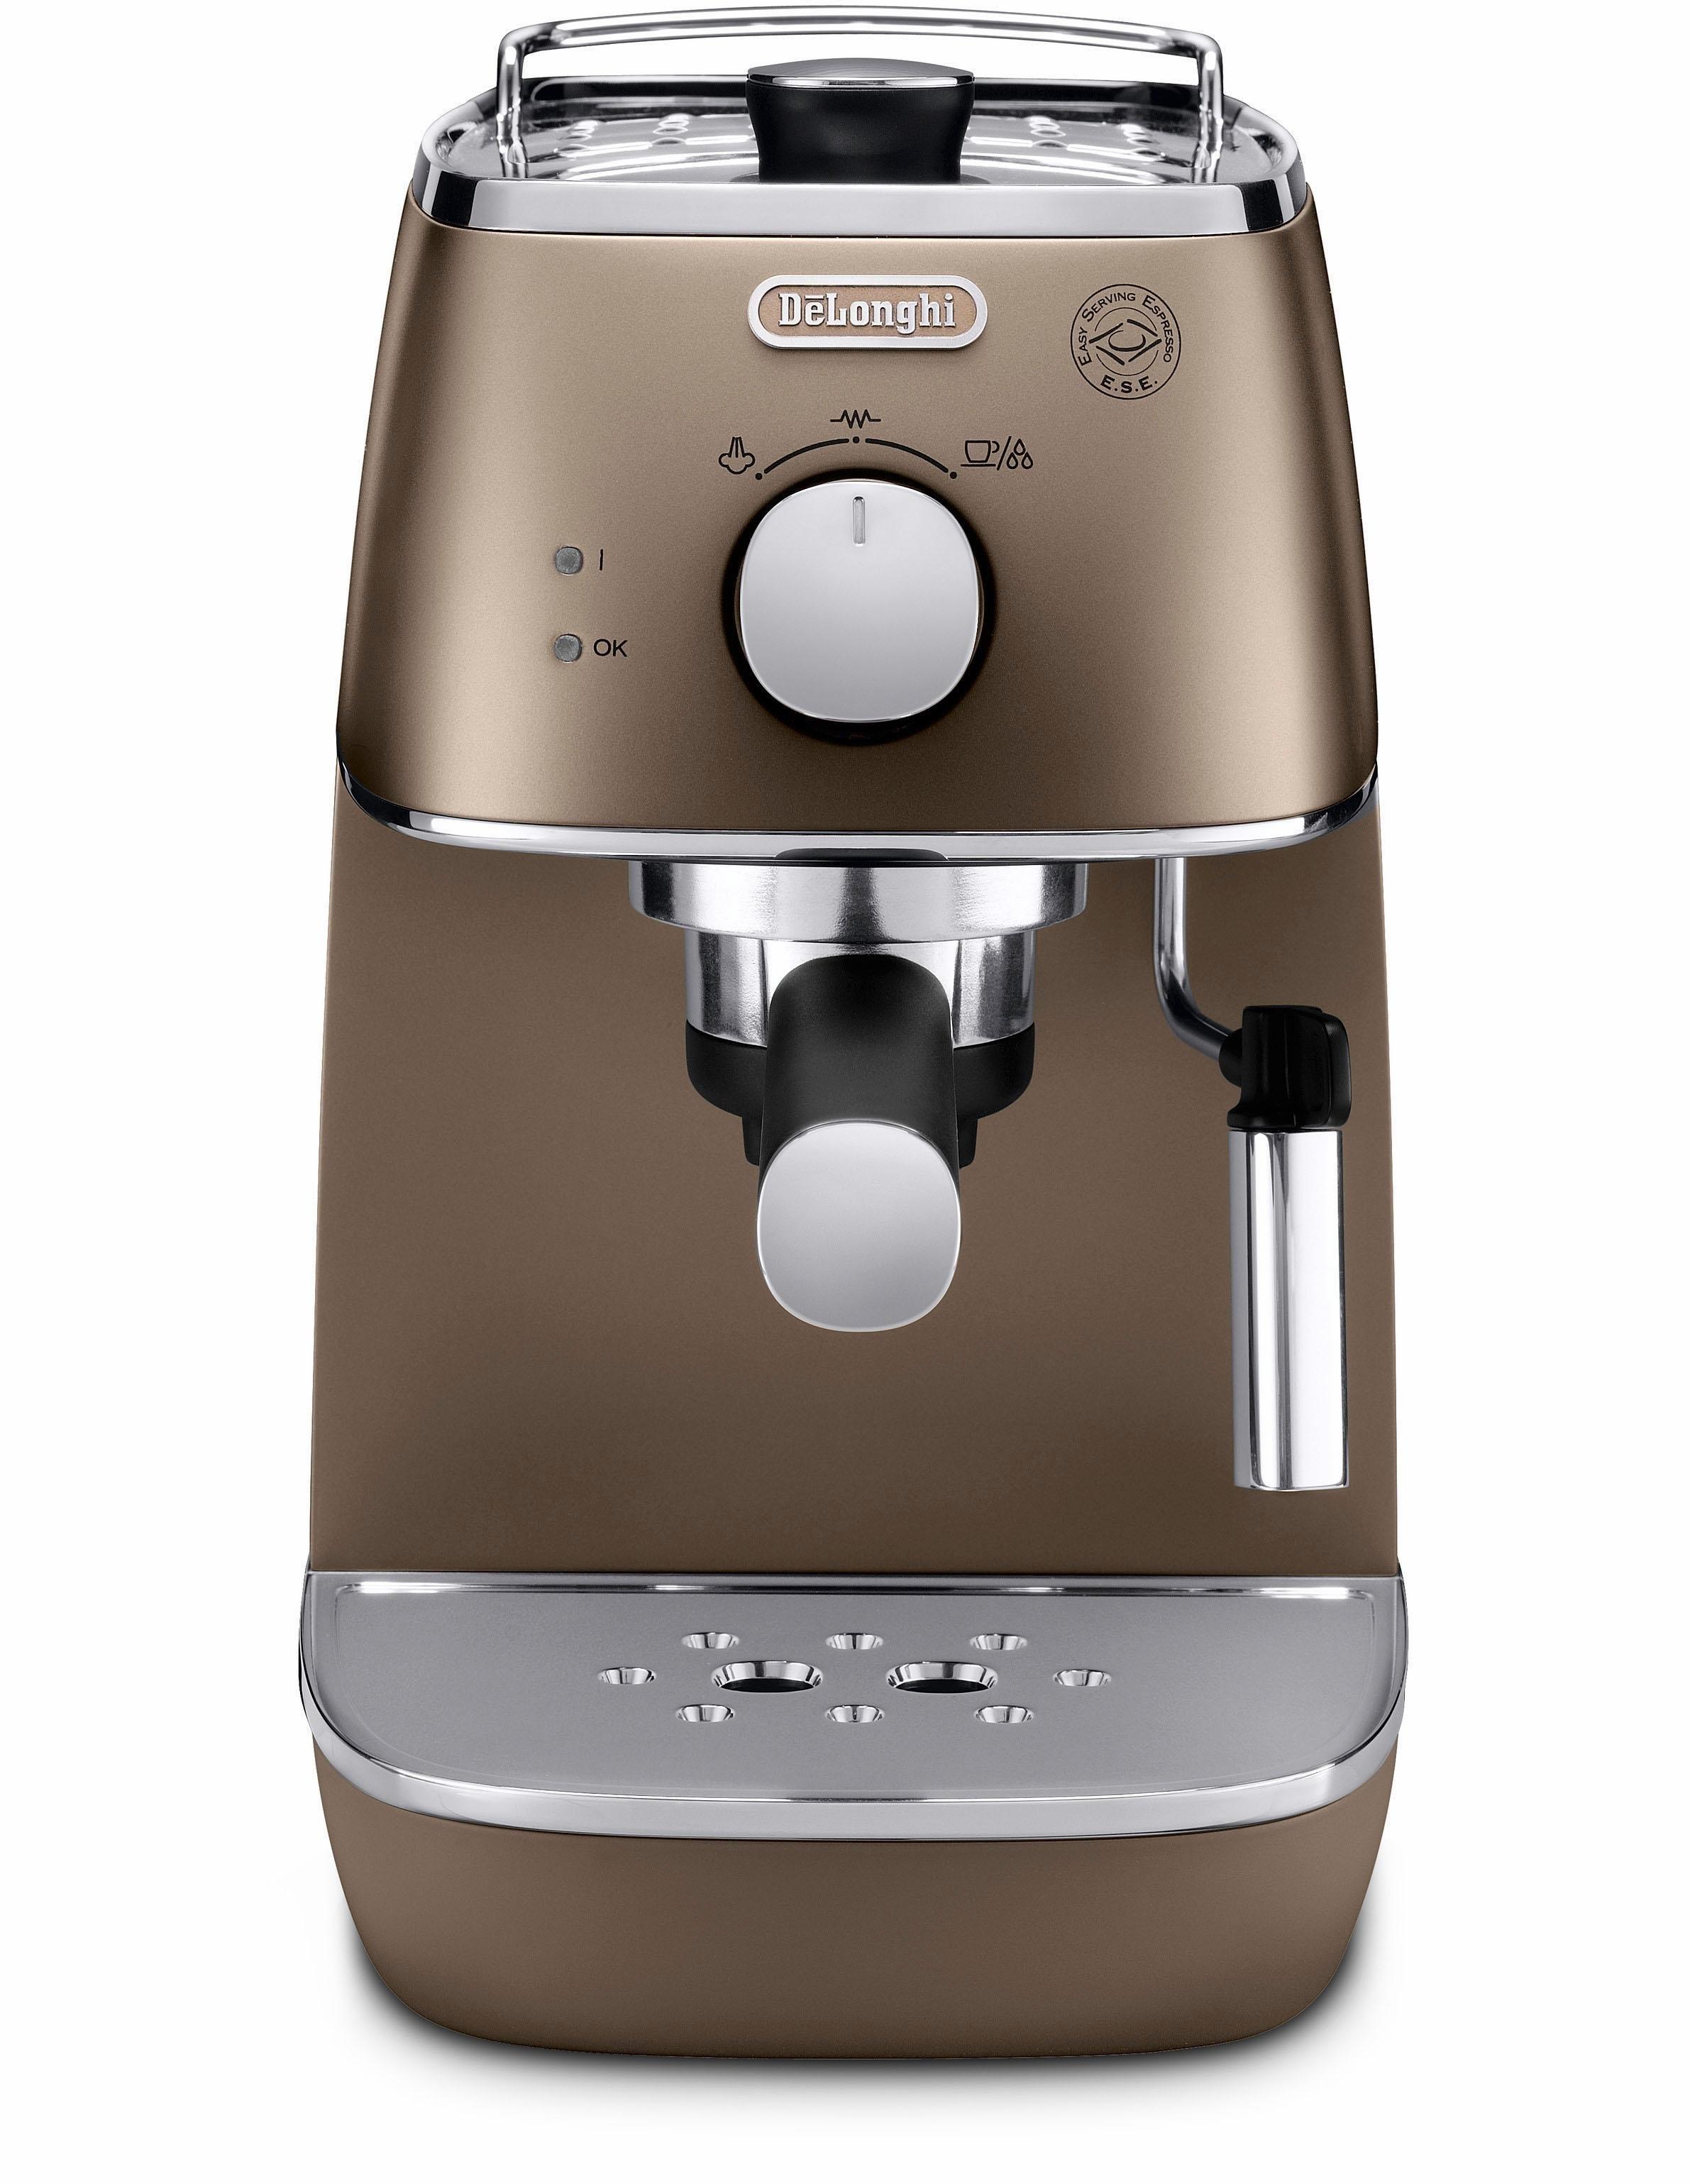 De'longhi espressoapparaat Distinta ECI 341.BZ online kopen op otto.nl